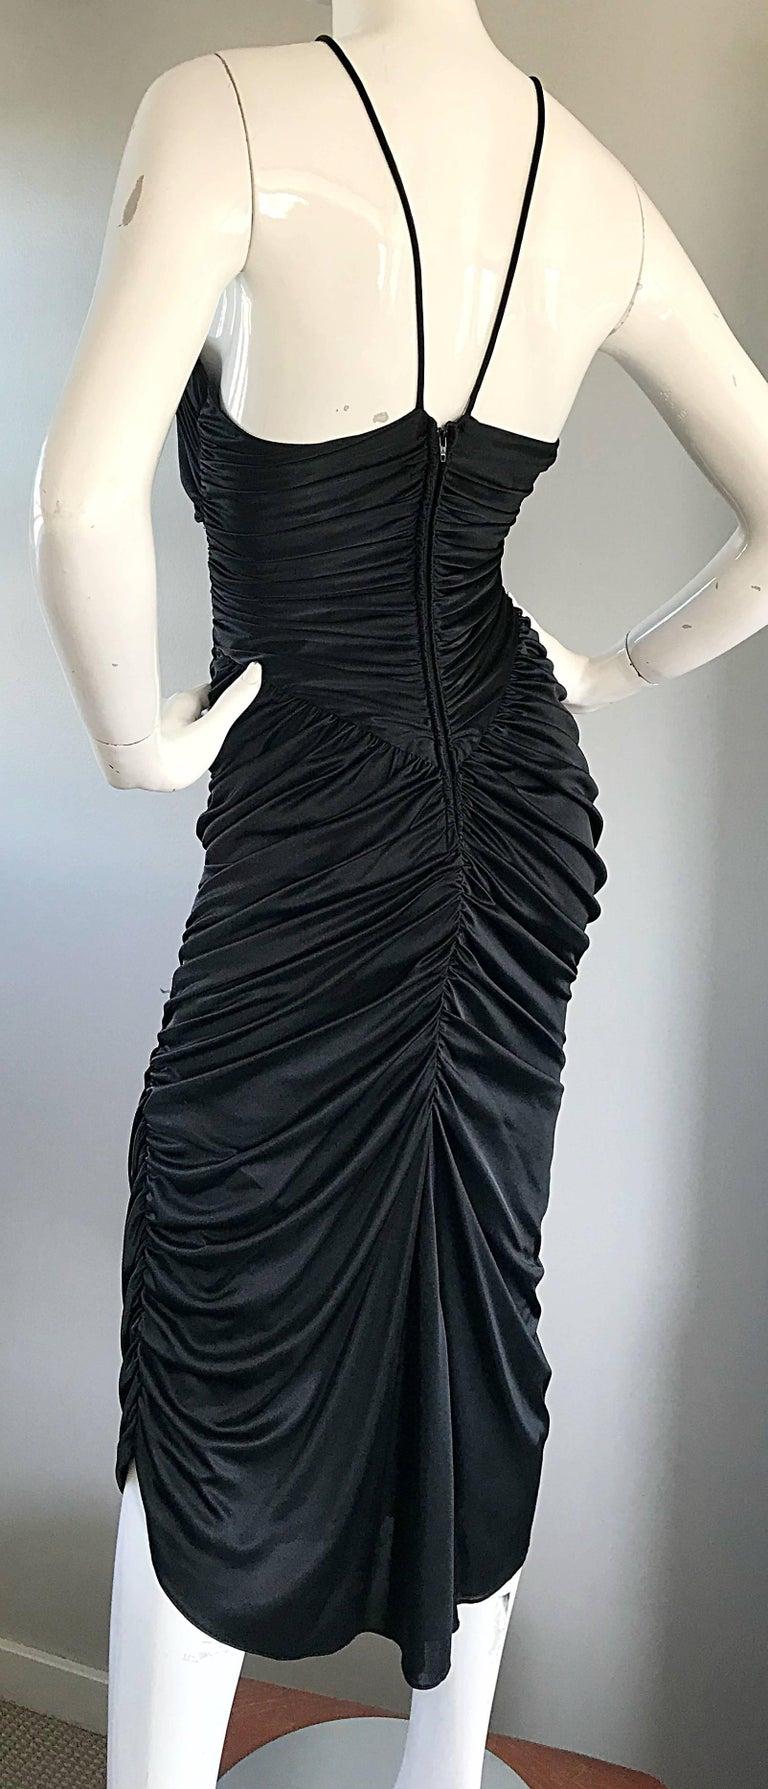 1970s Vintage Samir Black Beaded + Pearl + Rhinestone Sexy Ruched 70s Dress 6